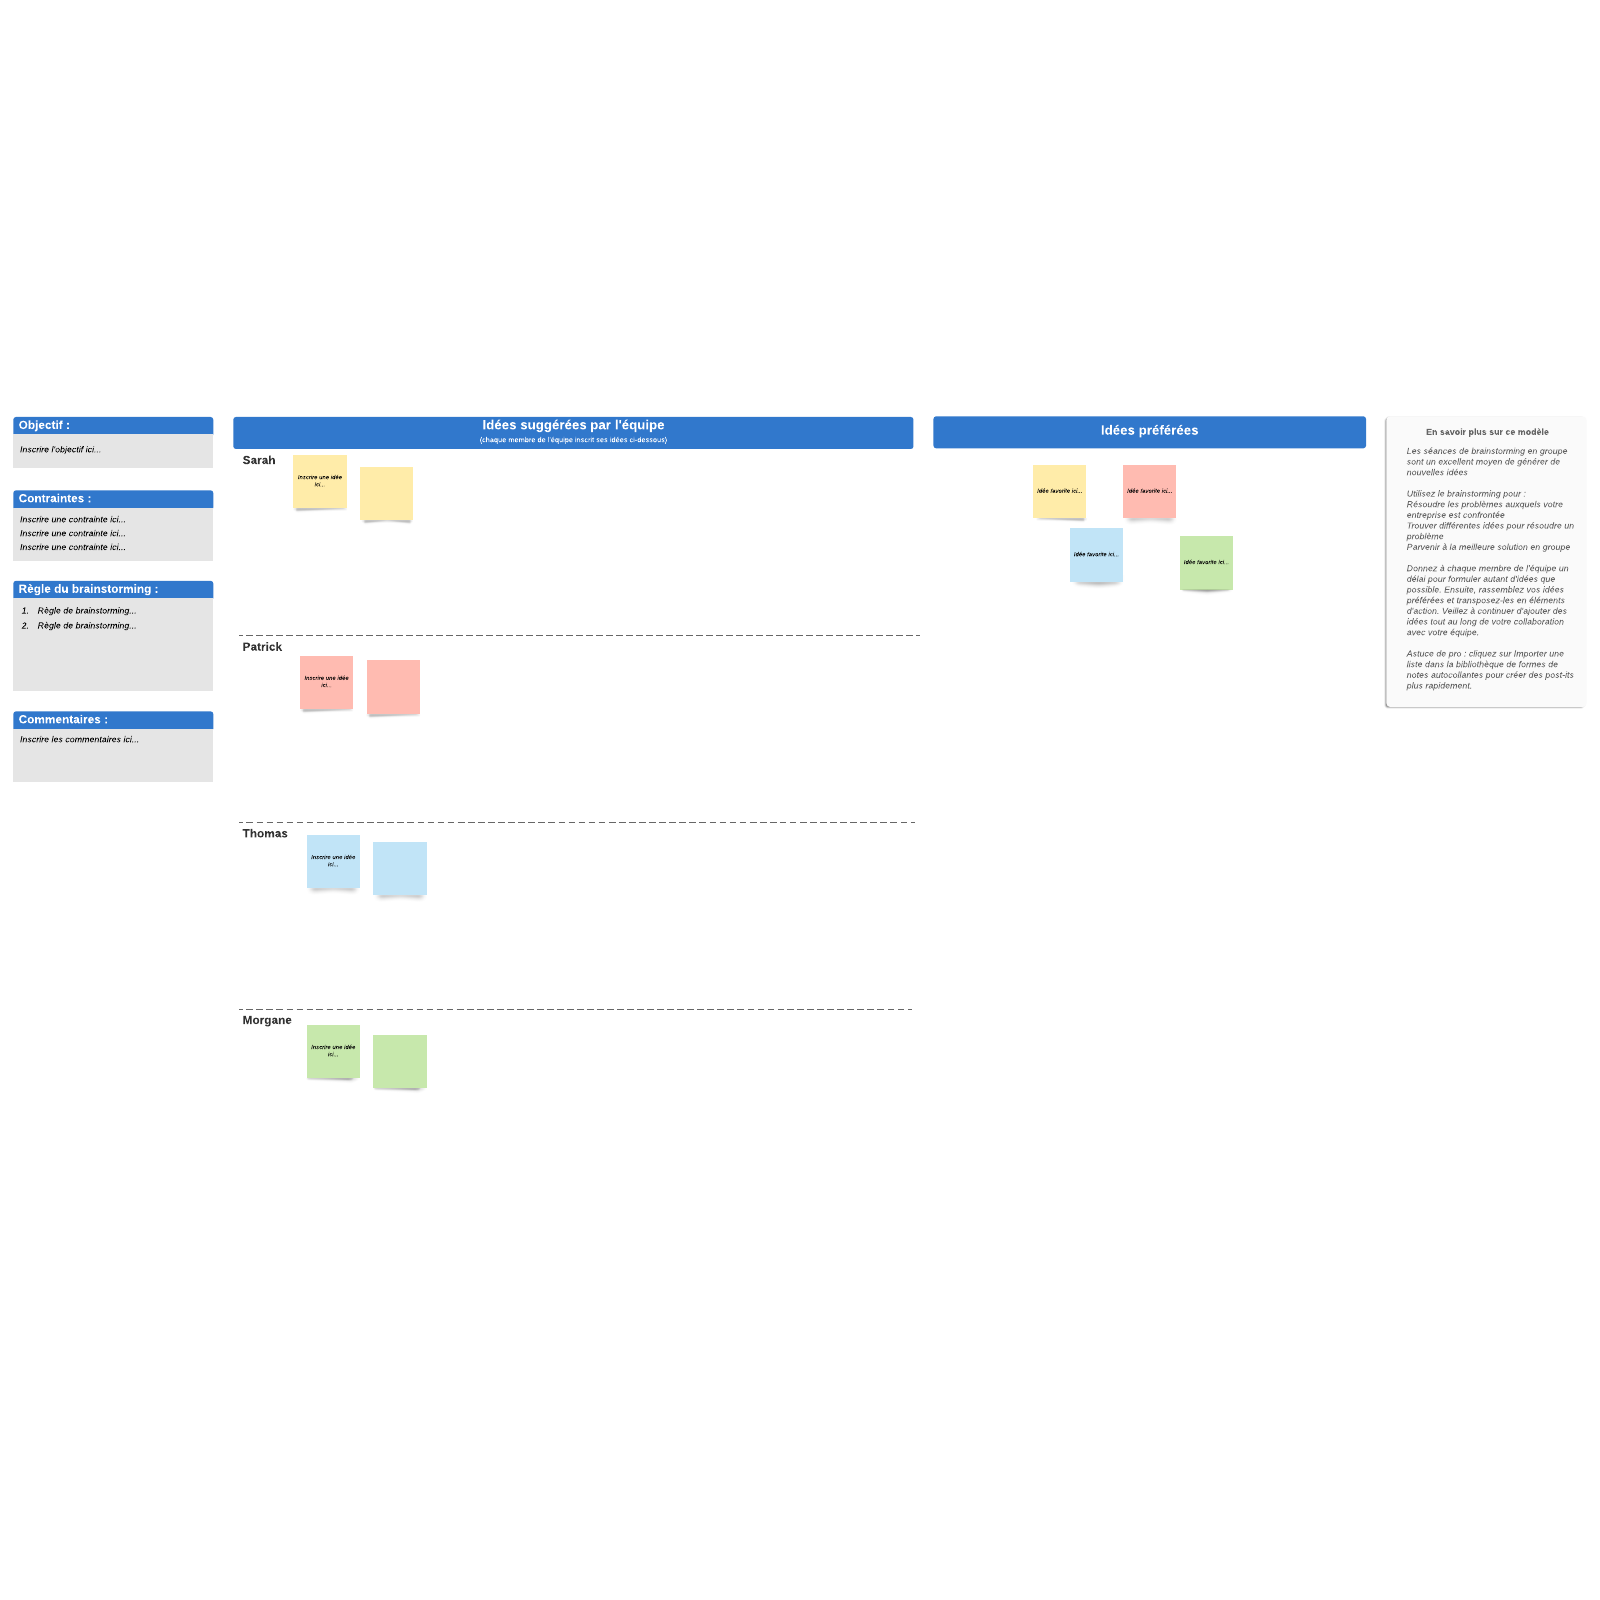 exemple de tableau de brainstorming